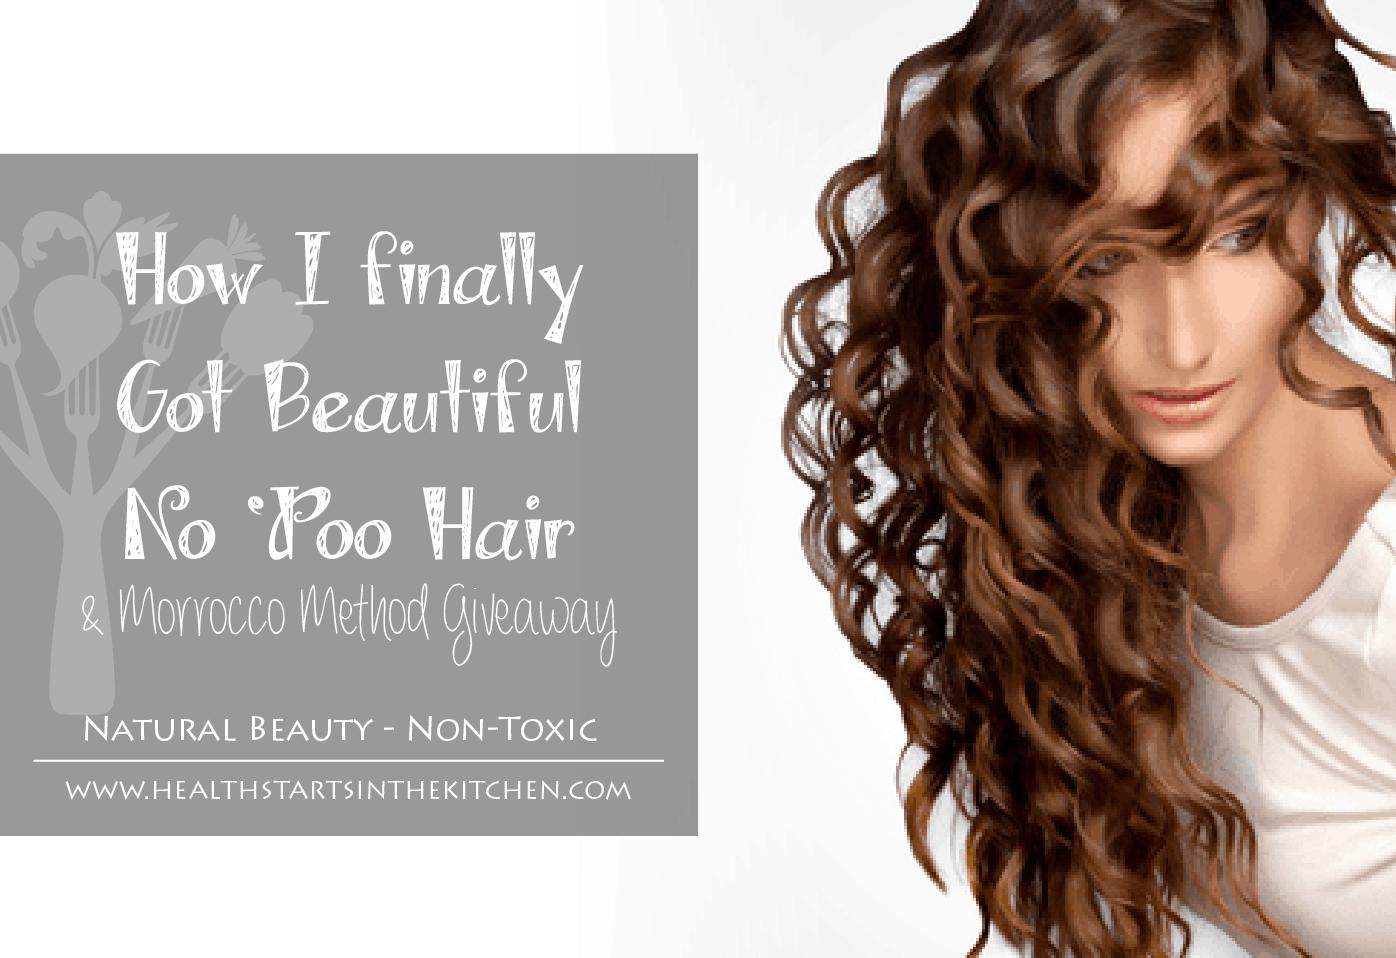 How I Finally Got Beautiful No Poo Hair Amp A Morrocco